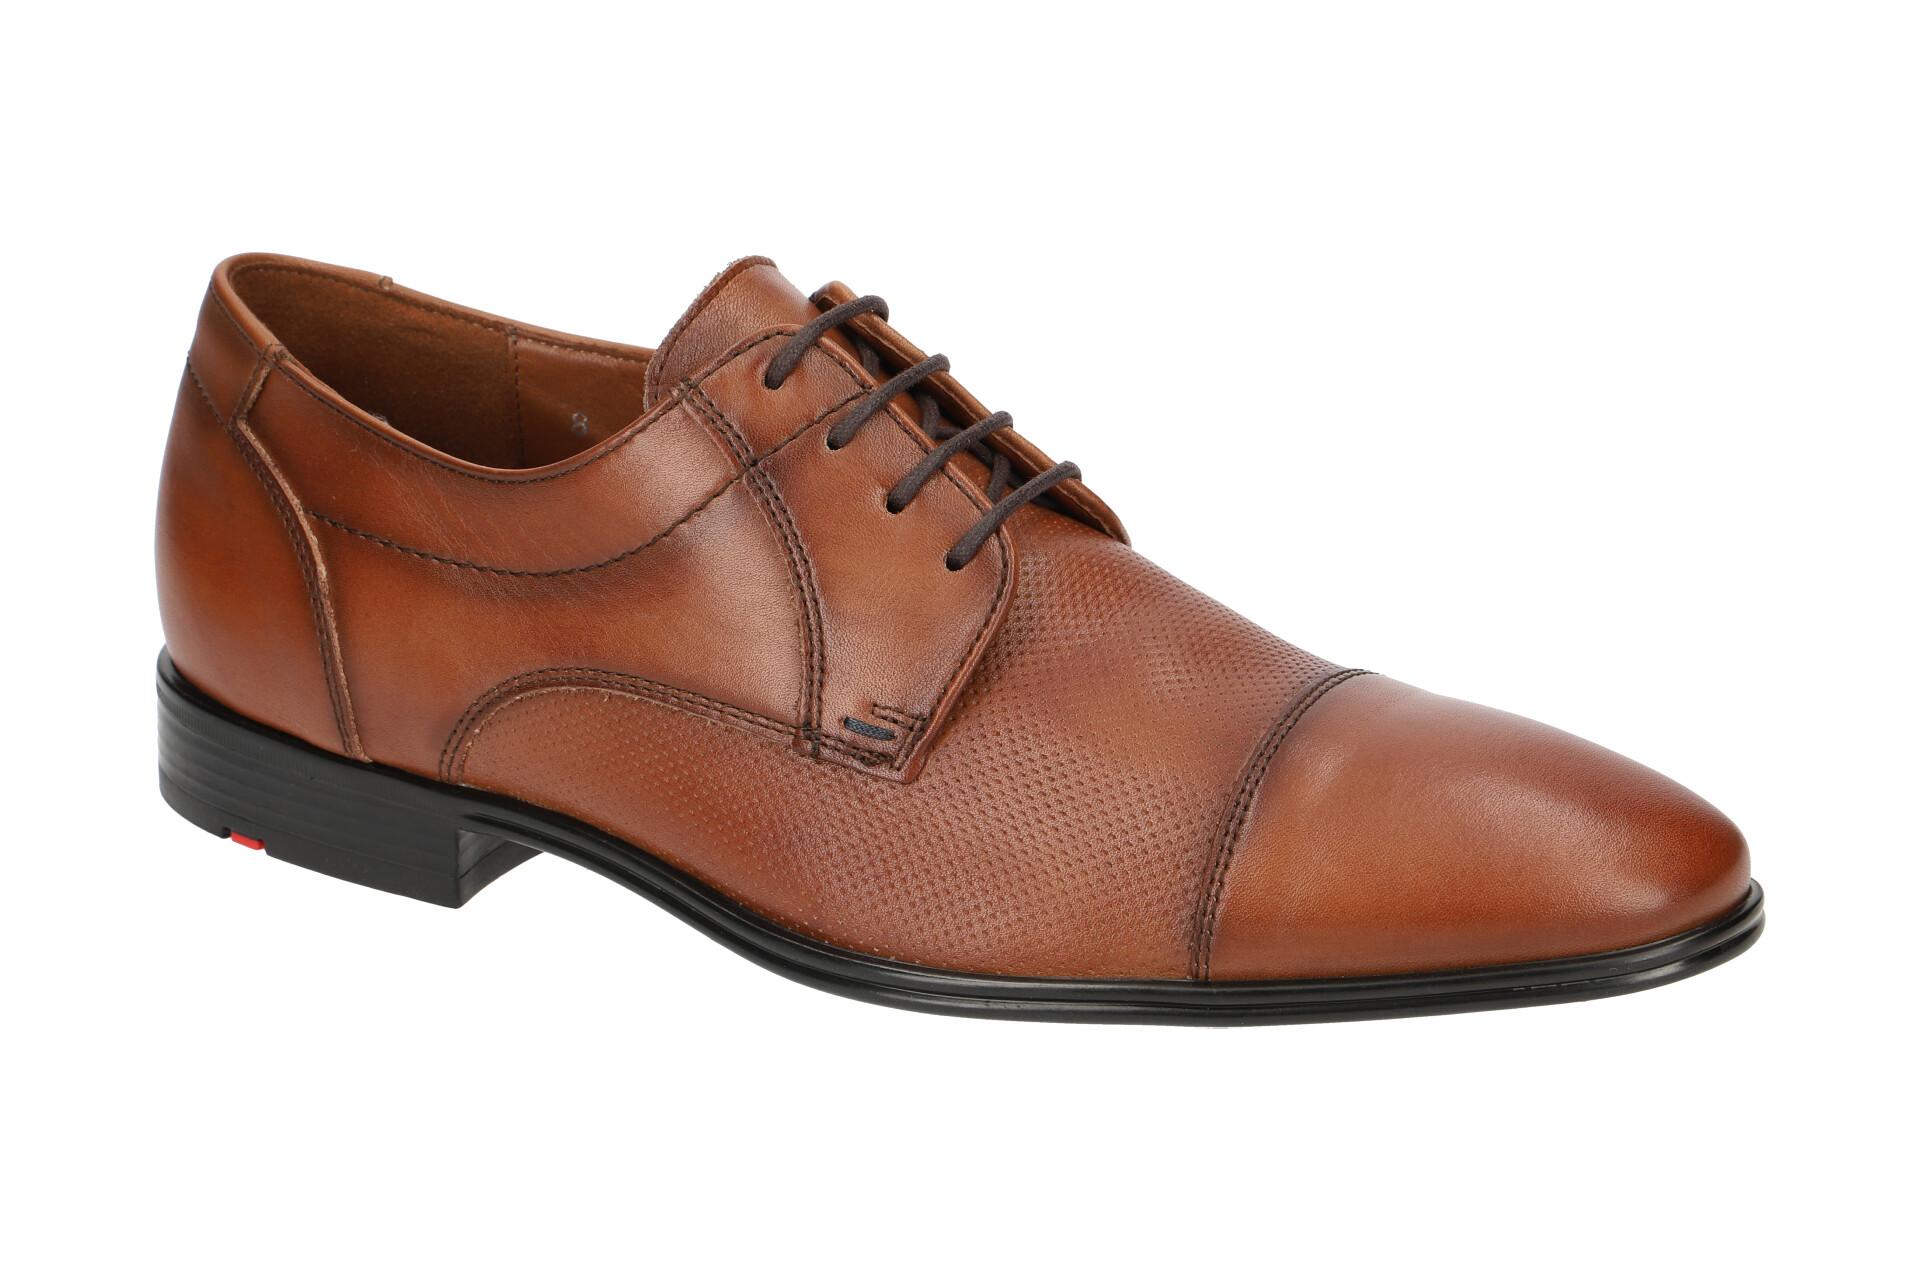 Oskar Zu 067 Schuhe Braun 19 Halbschuhe Neu Details Herrenschuhe 13 Lloyd Elegante EH9YWD2I